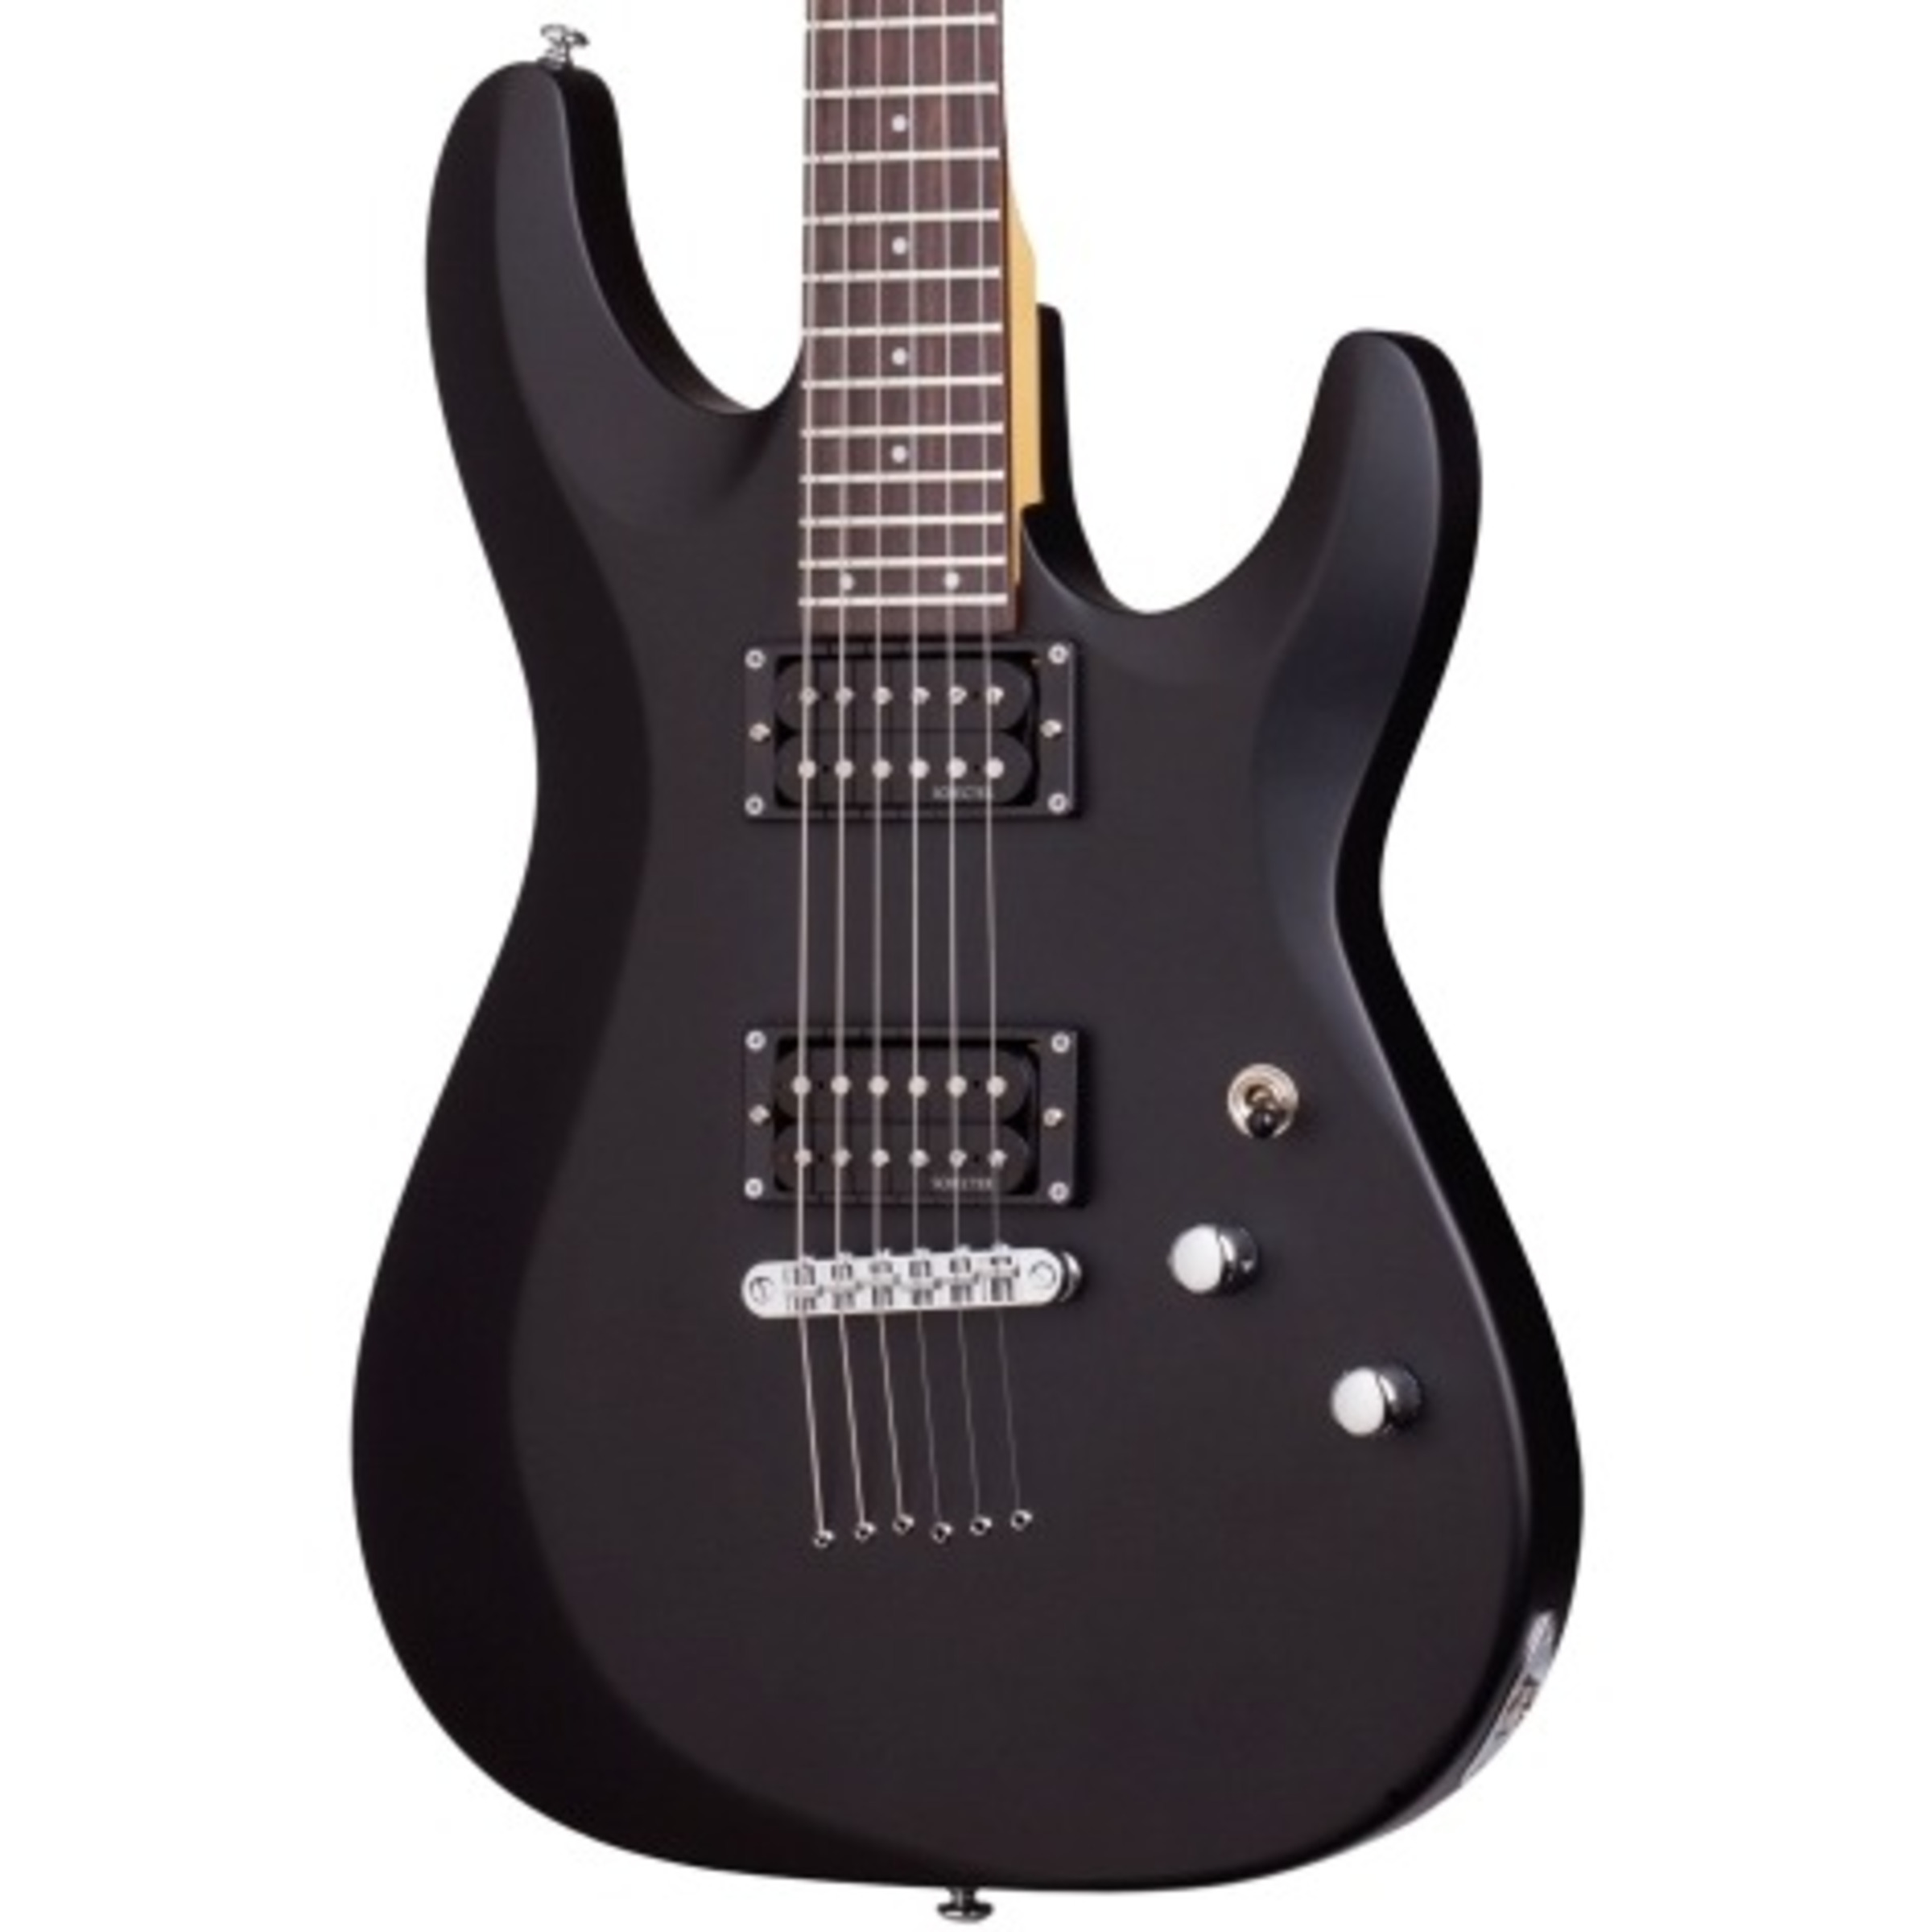 schecter c6 deluxe electric guitar satin black giggear. Black Bedroom Furniture Sets. Home Design Ideas